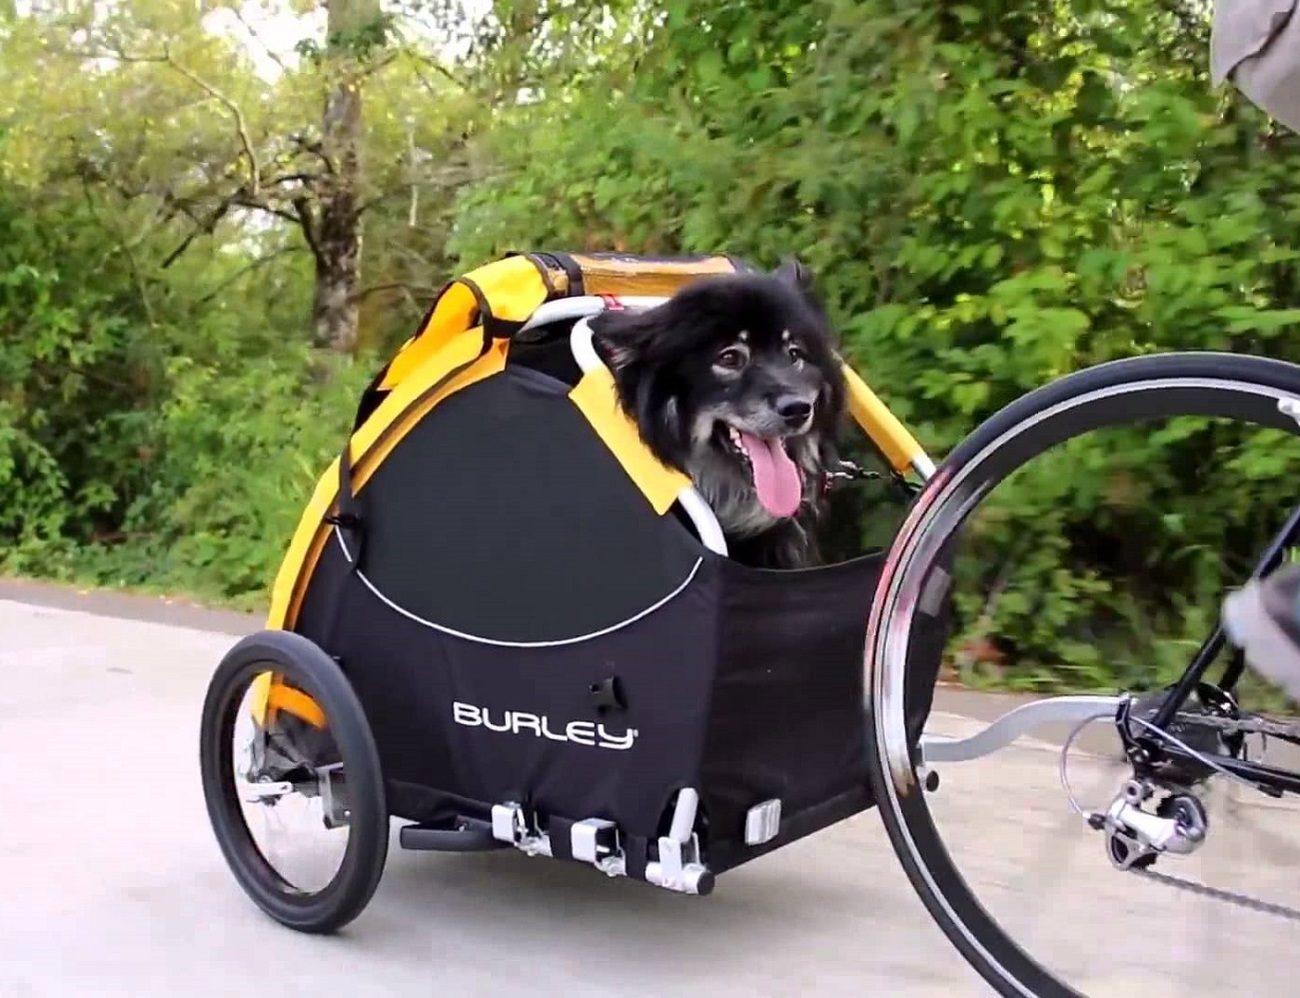 Burley Tail Wagon Pet Bike Trailer Stroller » Gadget Flow